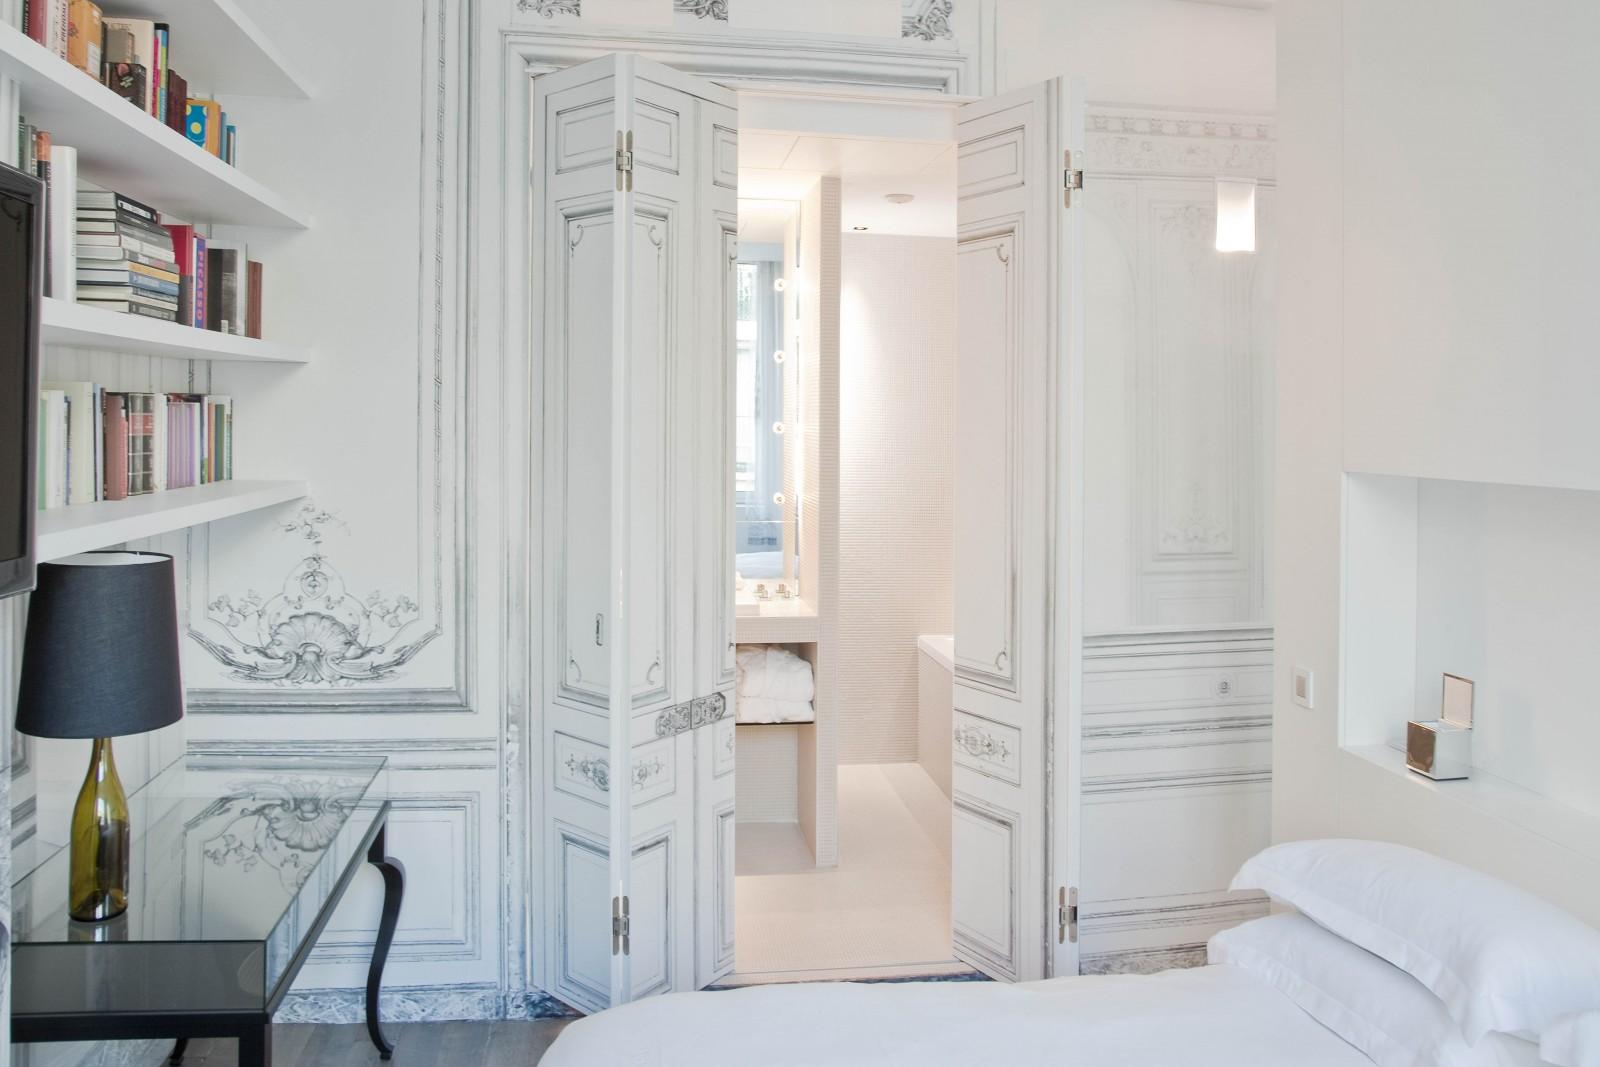 Maison-Martin-Margiela-Hotel-La-Maison-Champs-Elysees-1